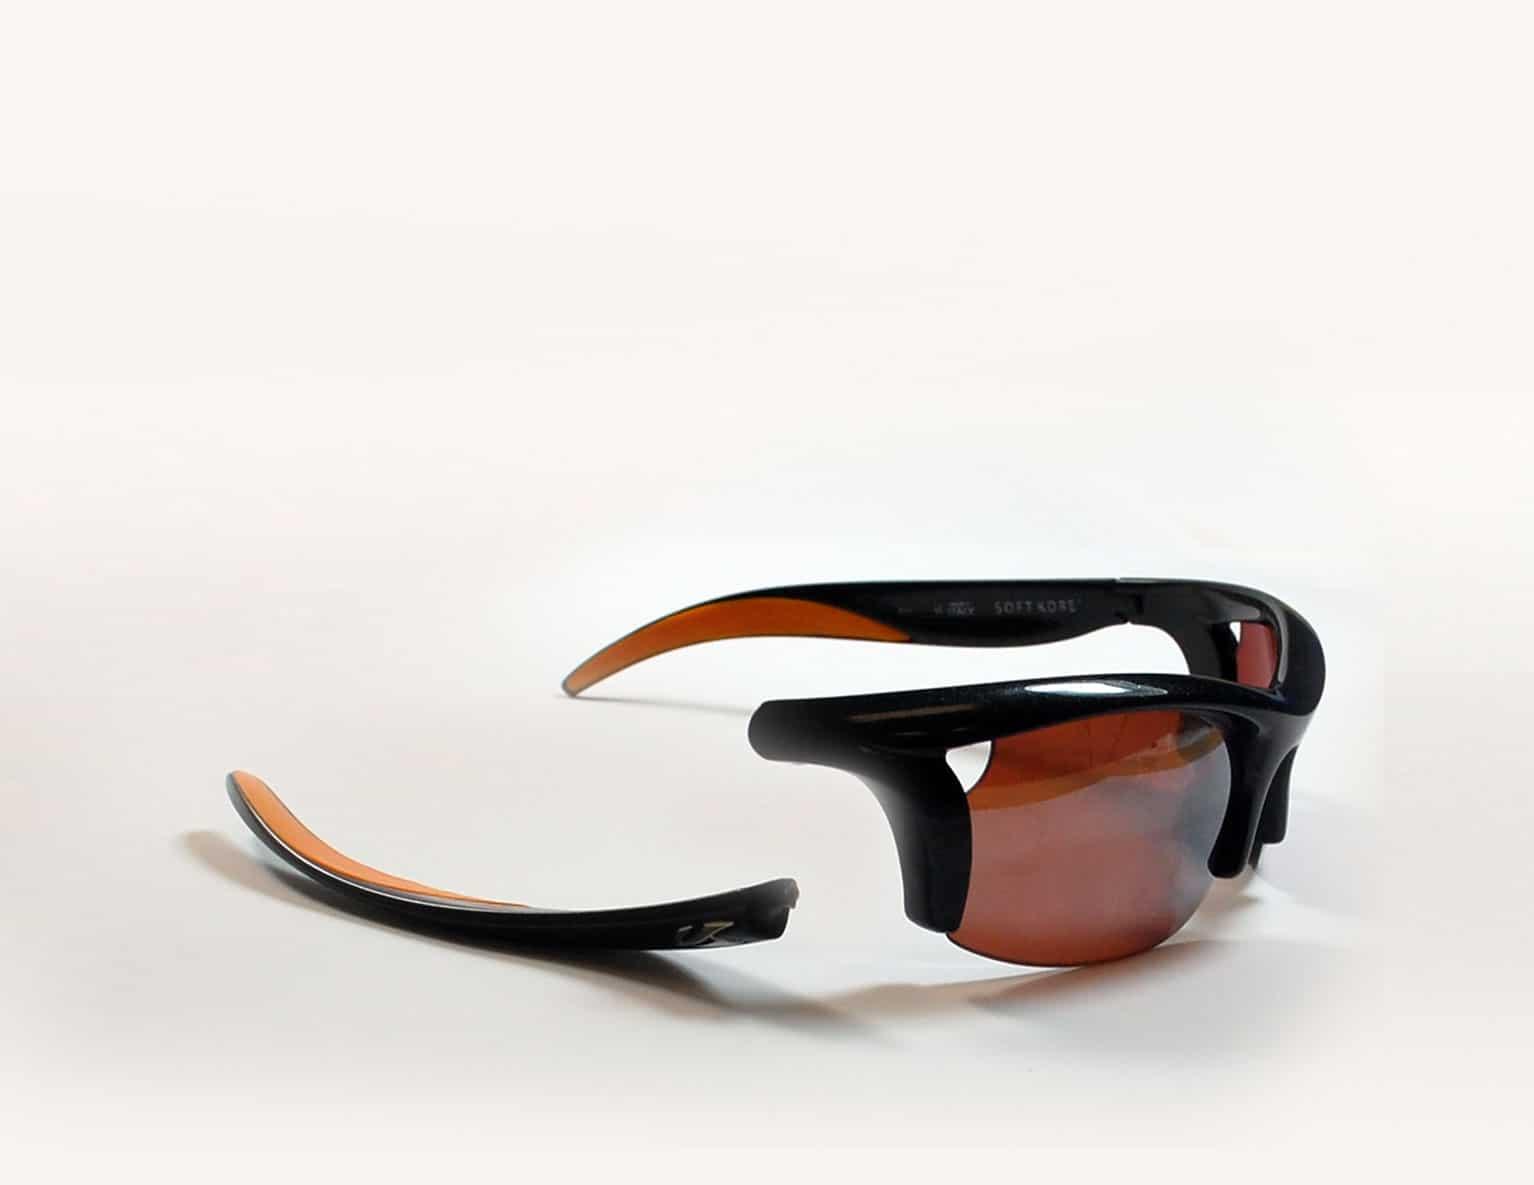 Broken Plastic Eyewear Arms